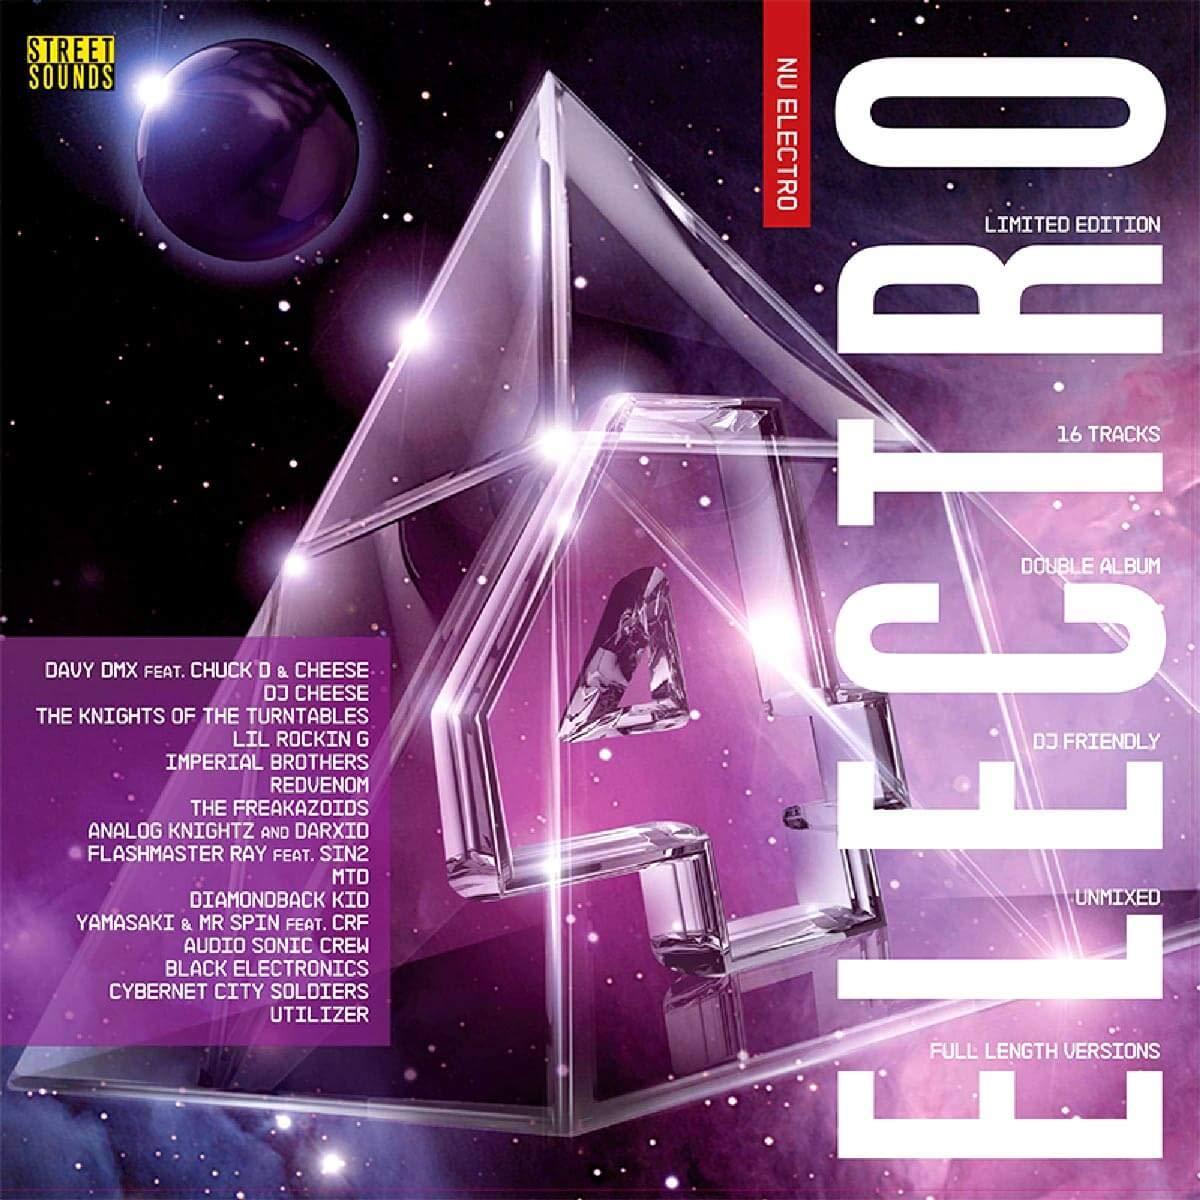 Vol. 4-Nu Electro [12 inch Analog]                                                                                                                                                                                                                                                                                                                                                                                                <span class=